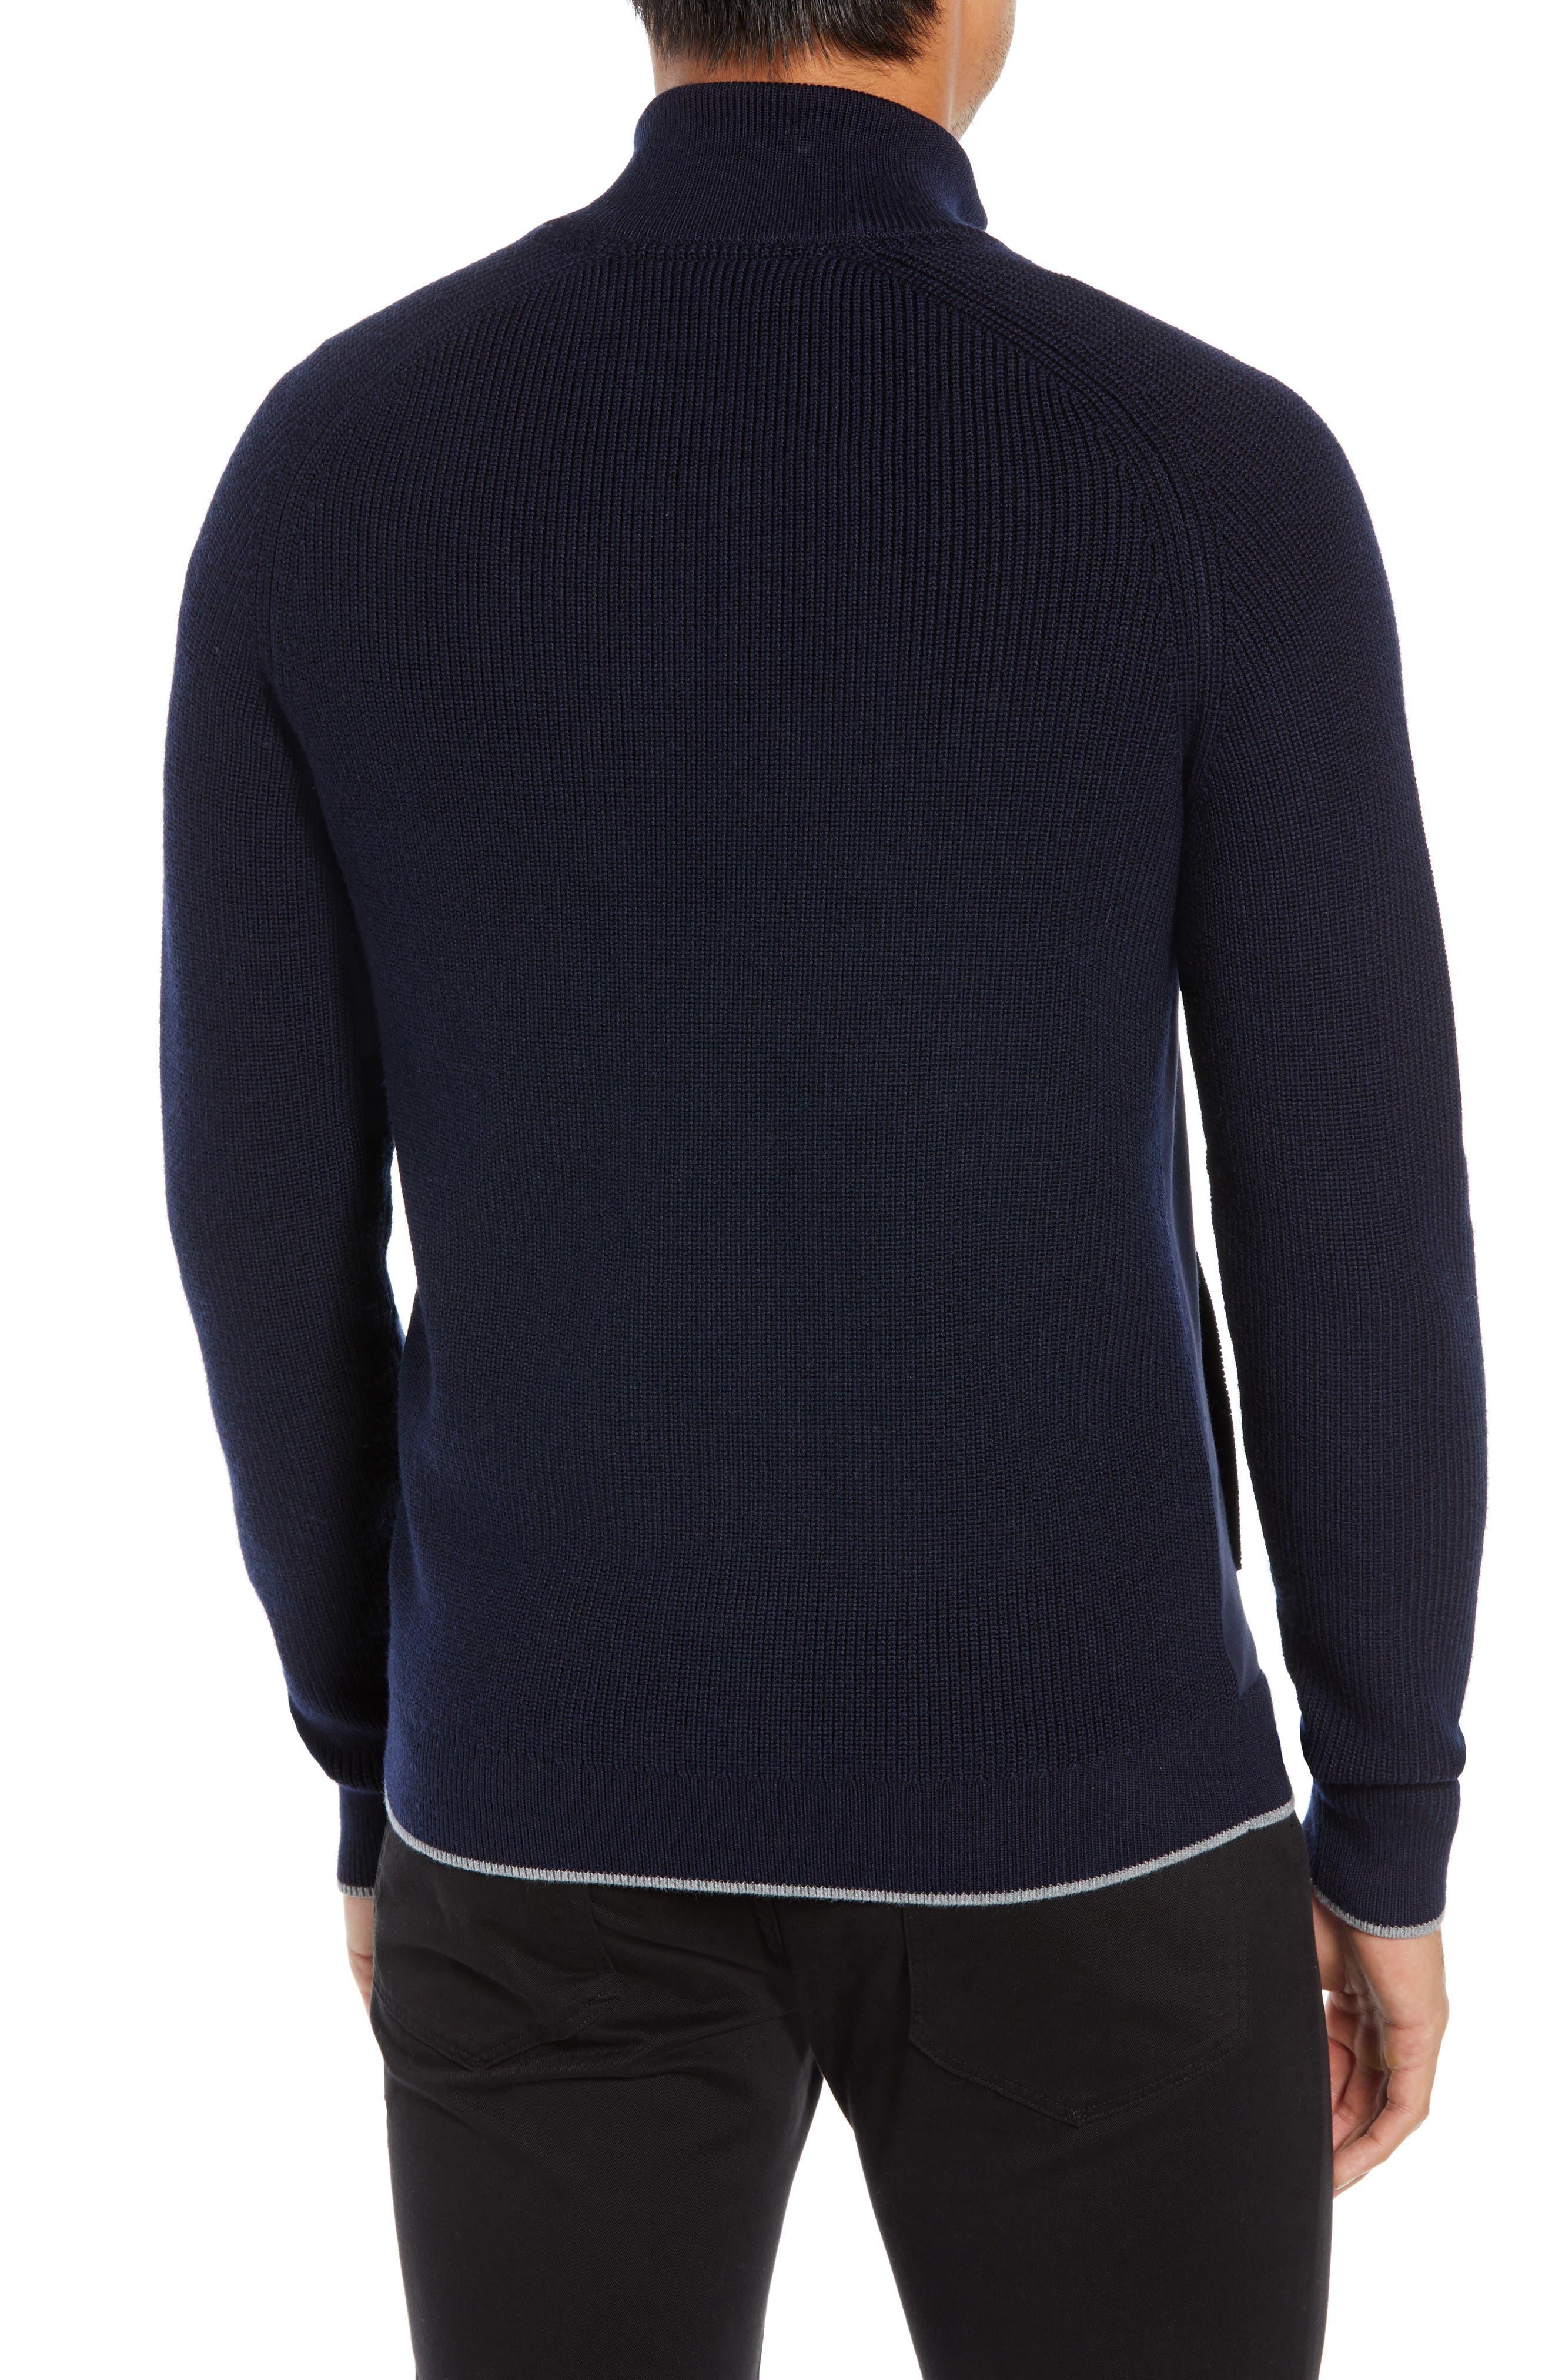 TED BAKER LONDON,                             Patrik Slim Fit Wool Zip Sweater,                             Alternate thumbnail 2, color,                             NAVY